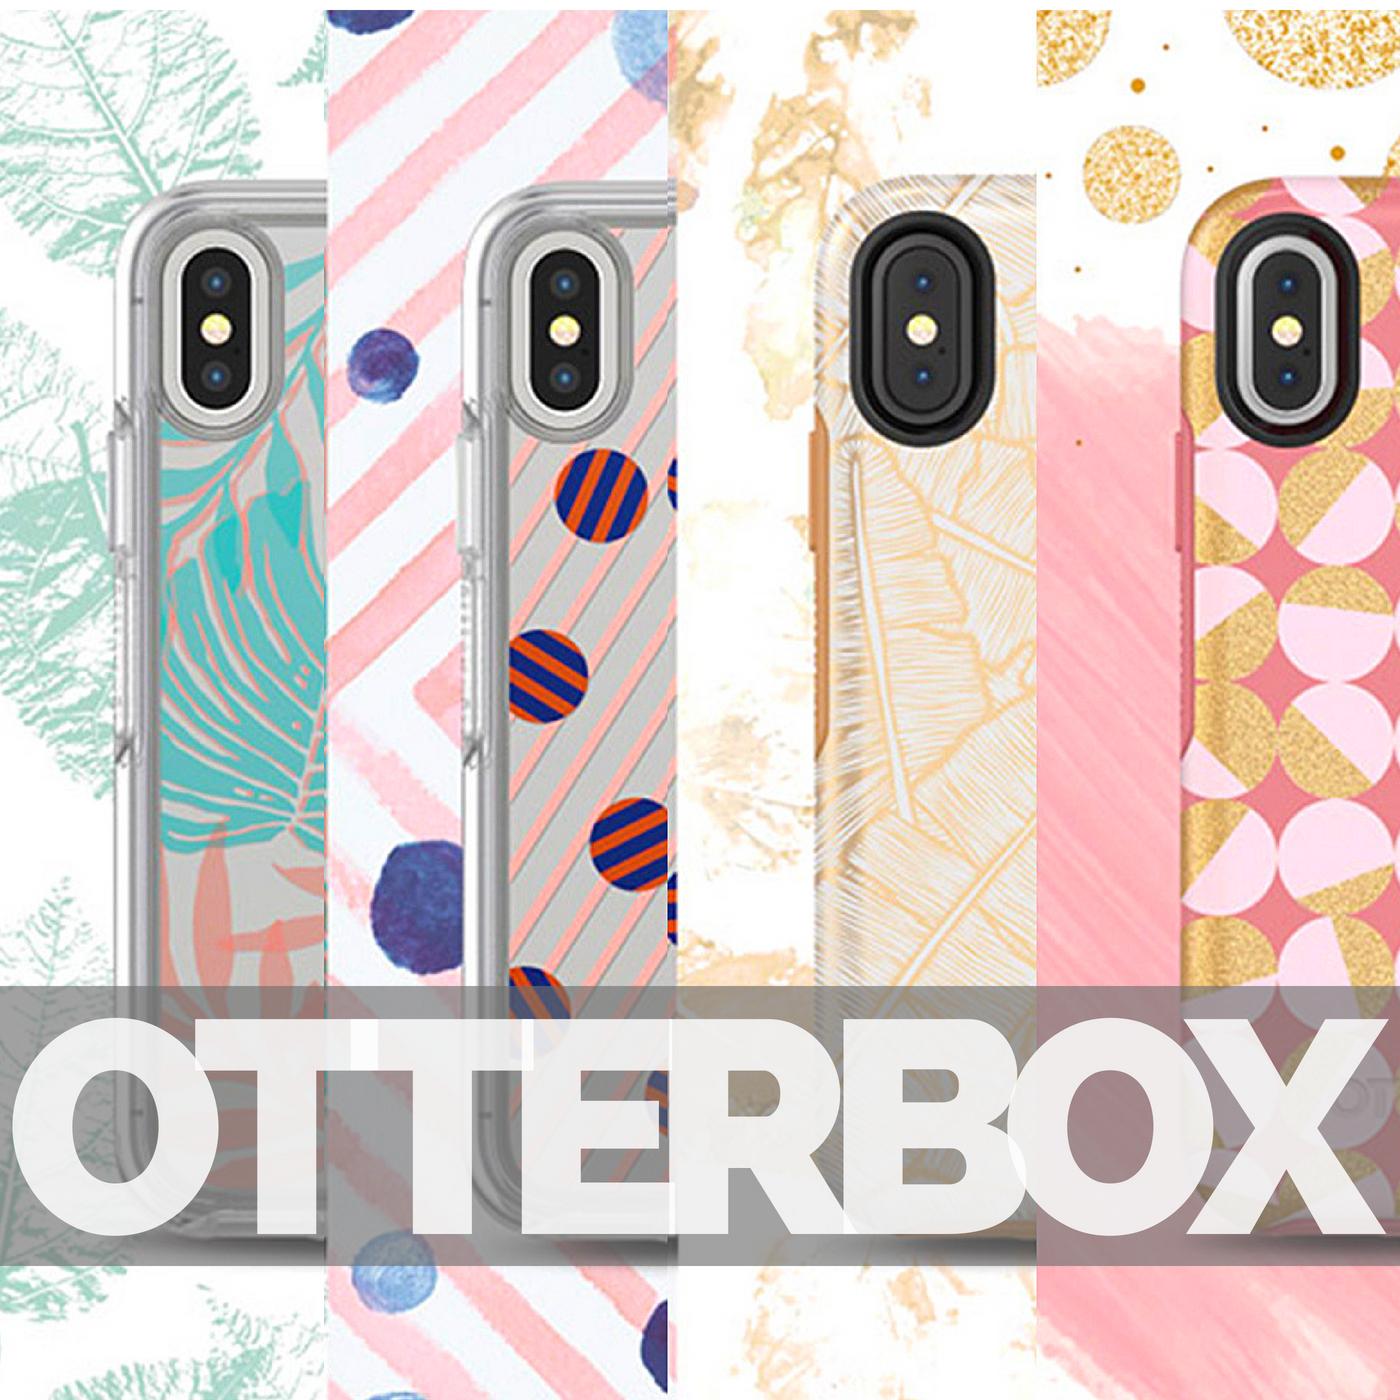 OtterBox 全系列|防摔+驗證・捍衛您的手機